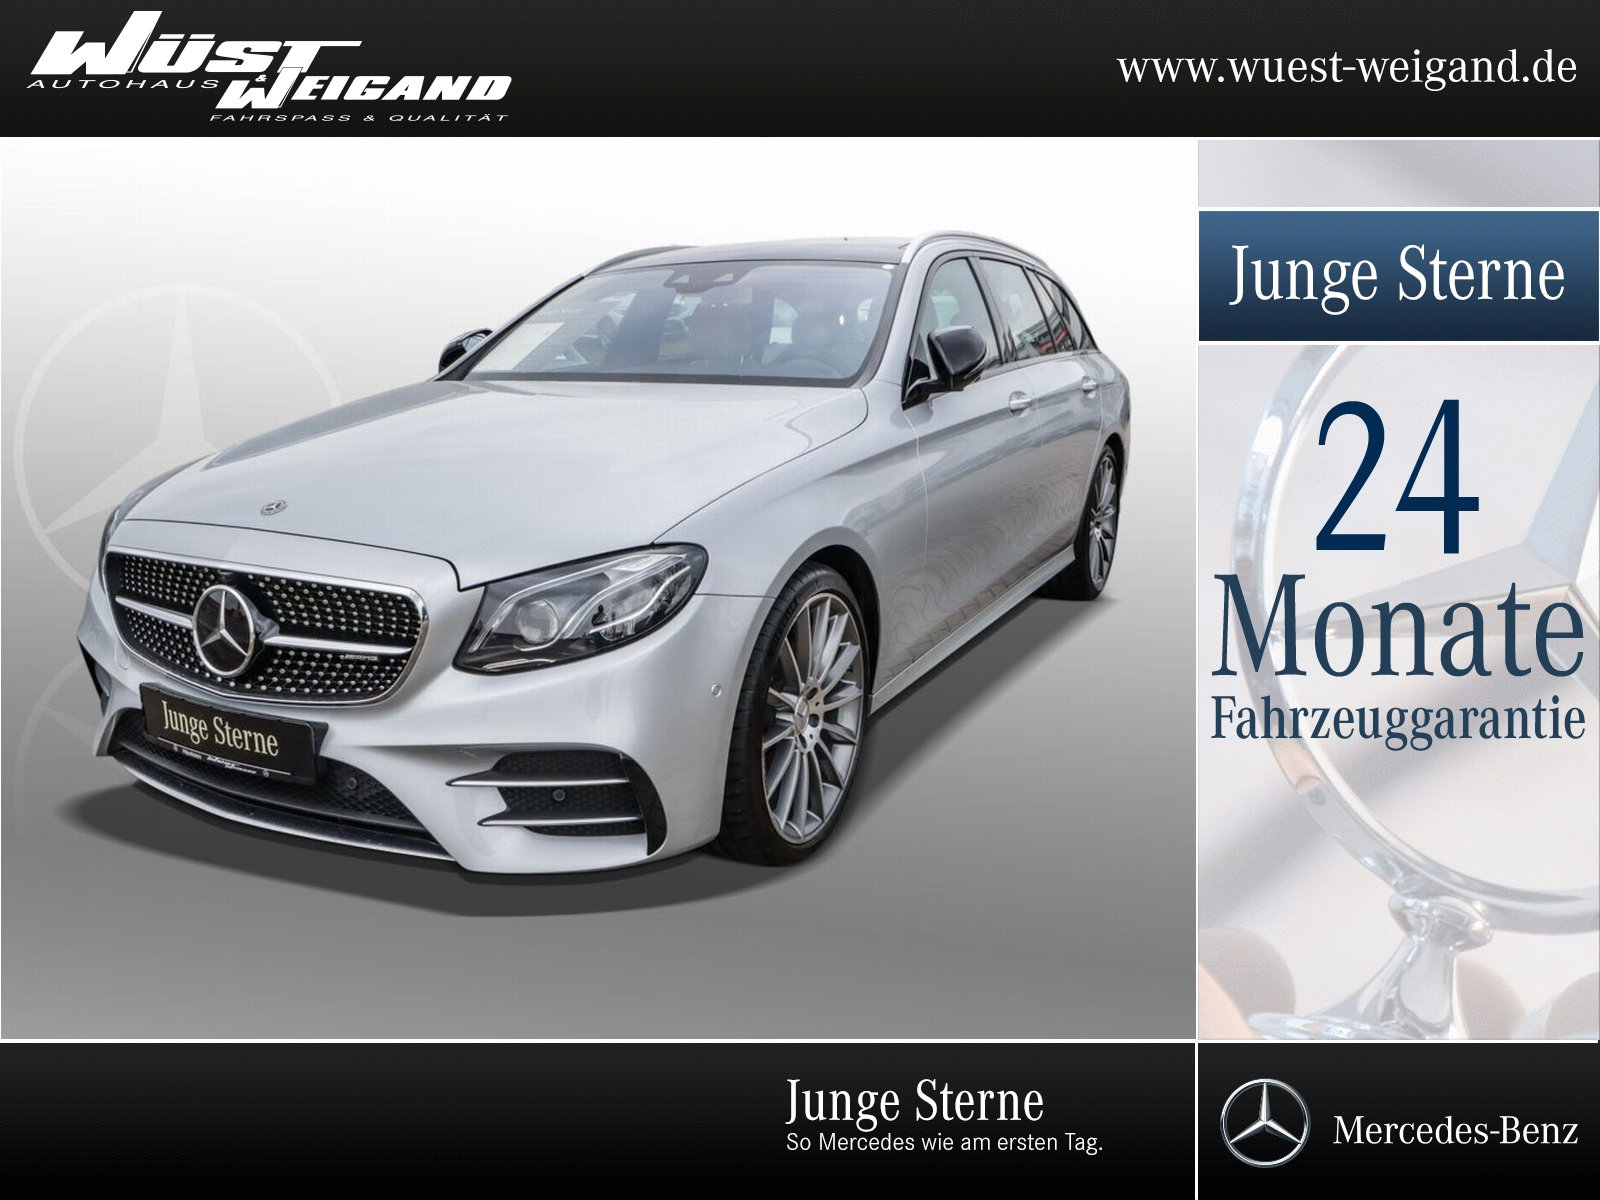 Mercedes-Benz E 43 AMG 4M T Pano+Comand+Kamera+Memory+Kamera, Jahr 2017, Benzin